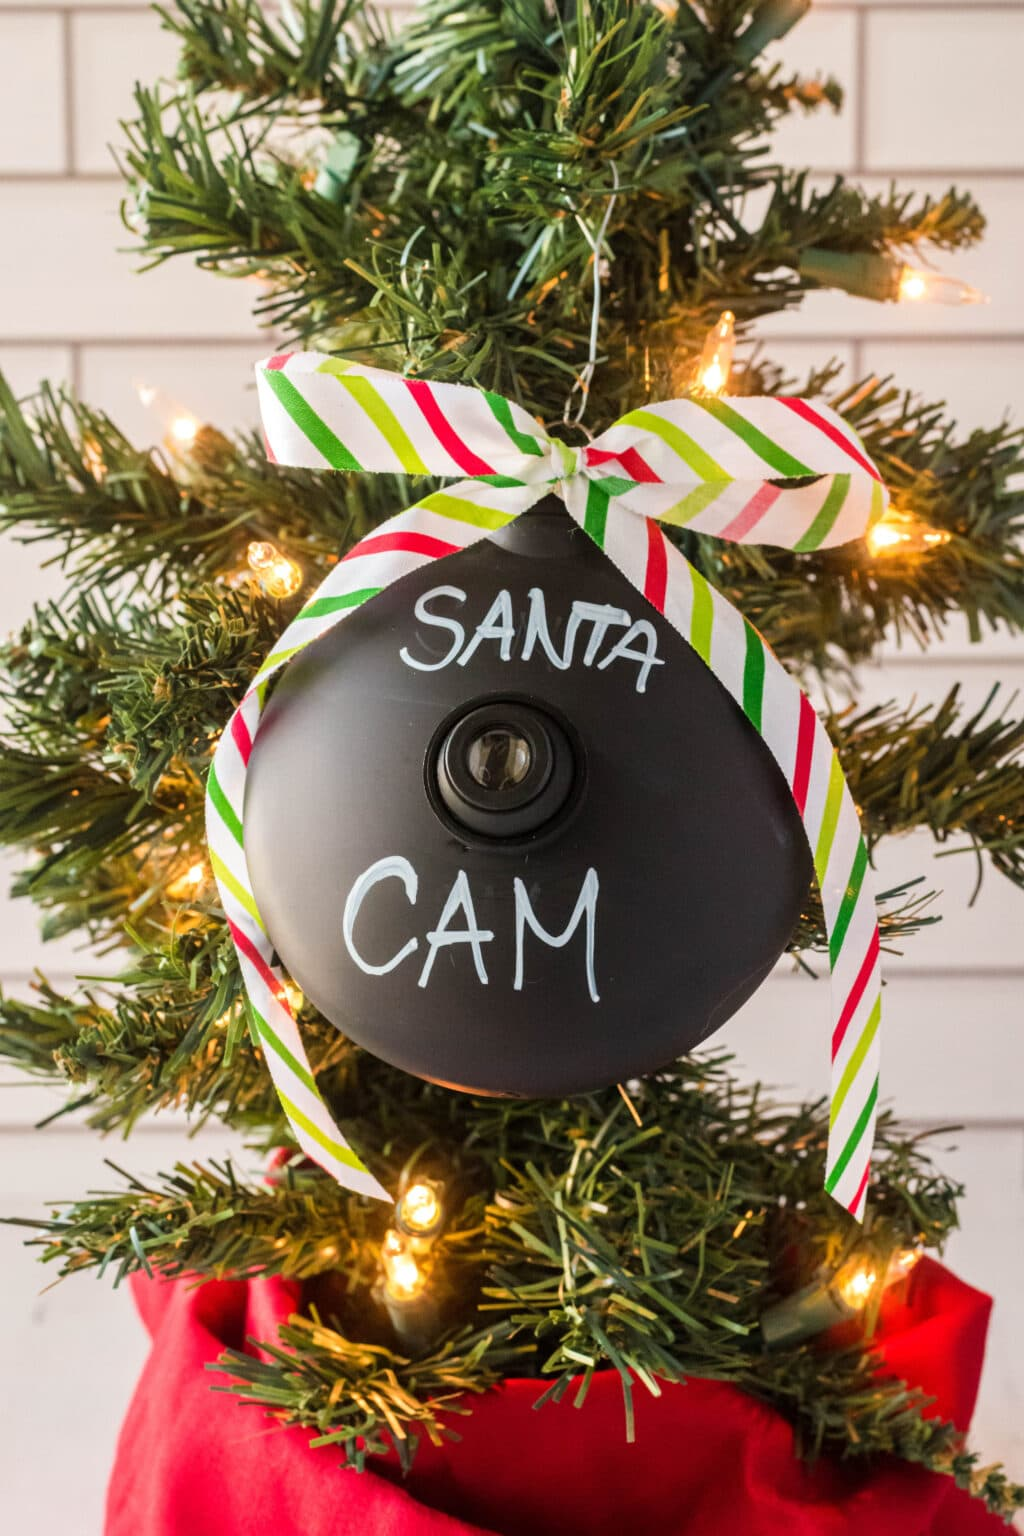 santa cam ornament hanging on a Christmas tree